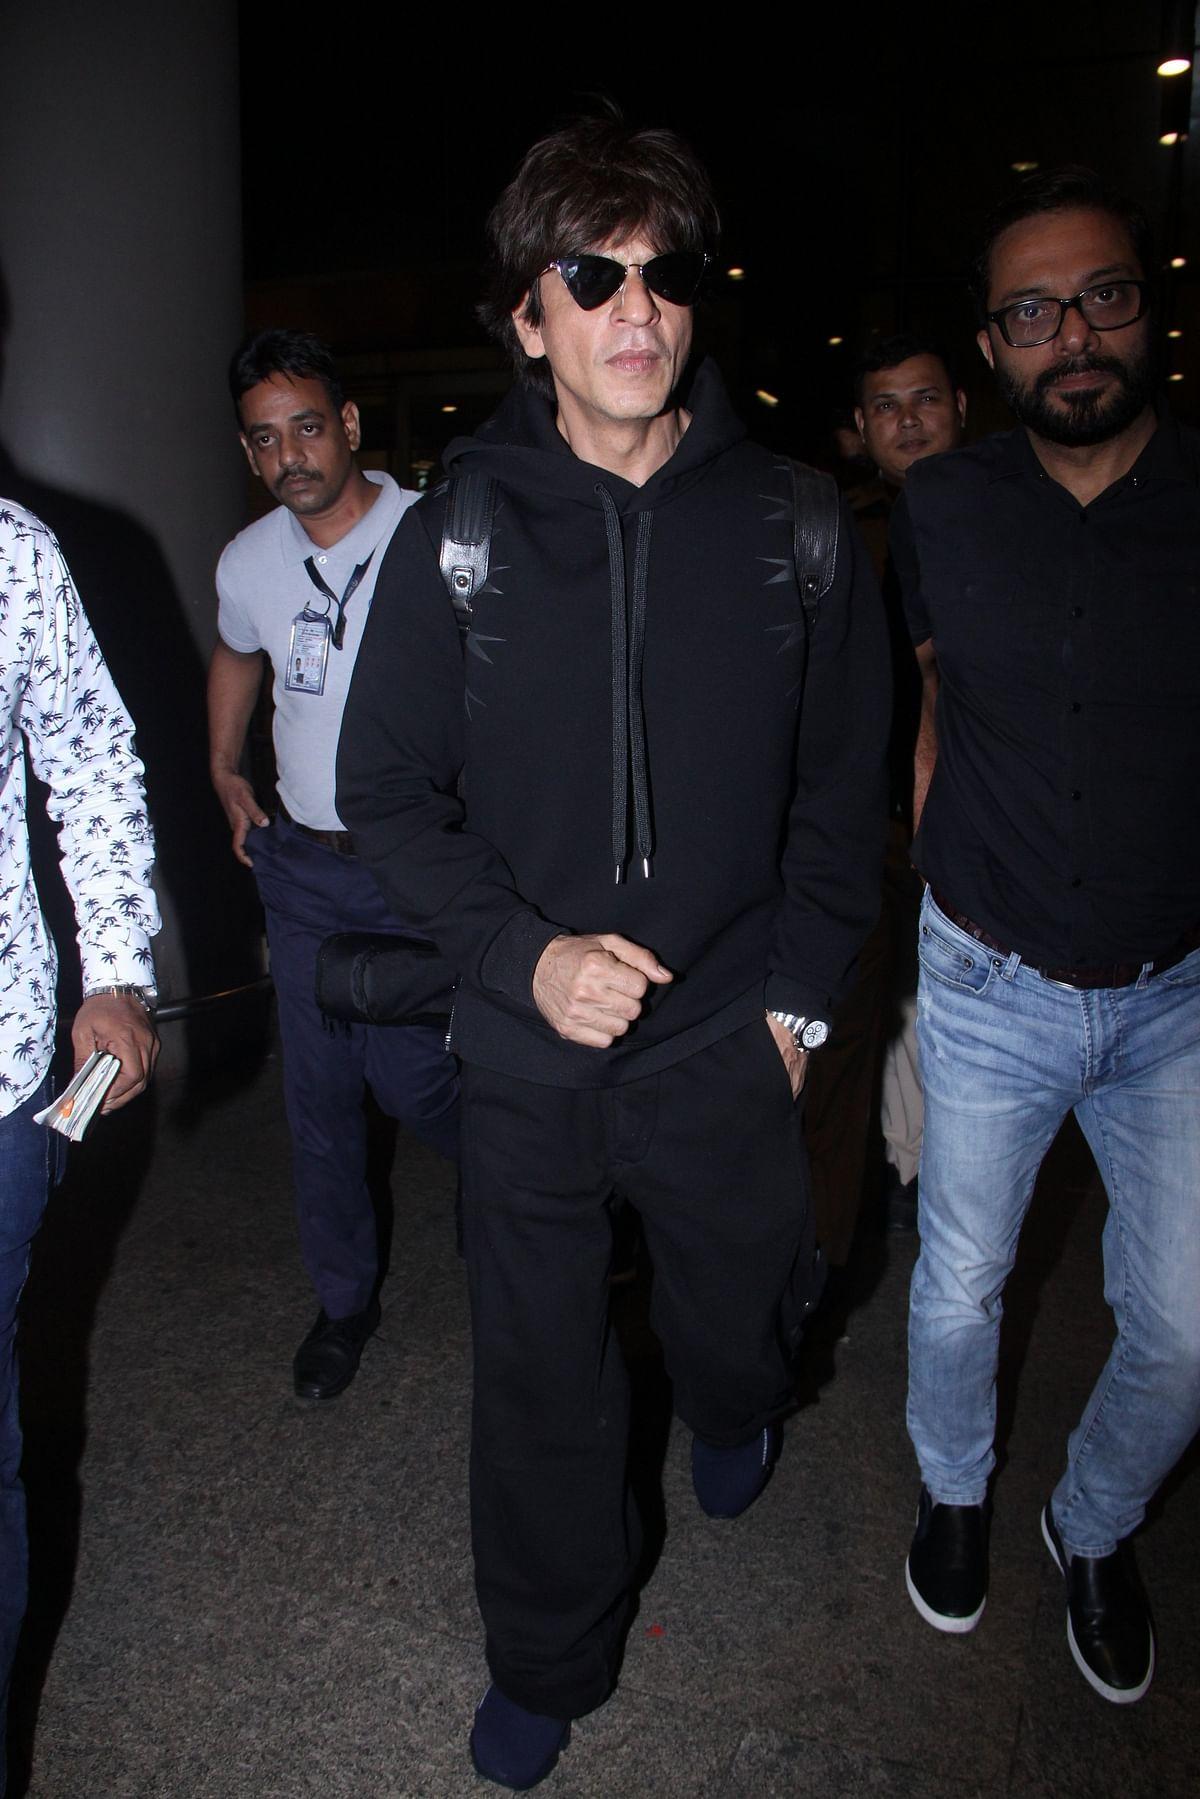 Shah Rukh Khan snapped in all black at Mumbai Airport